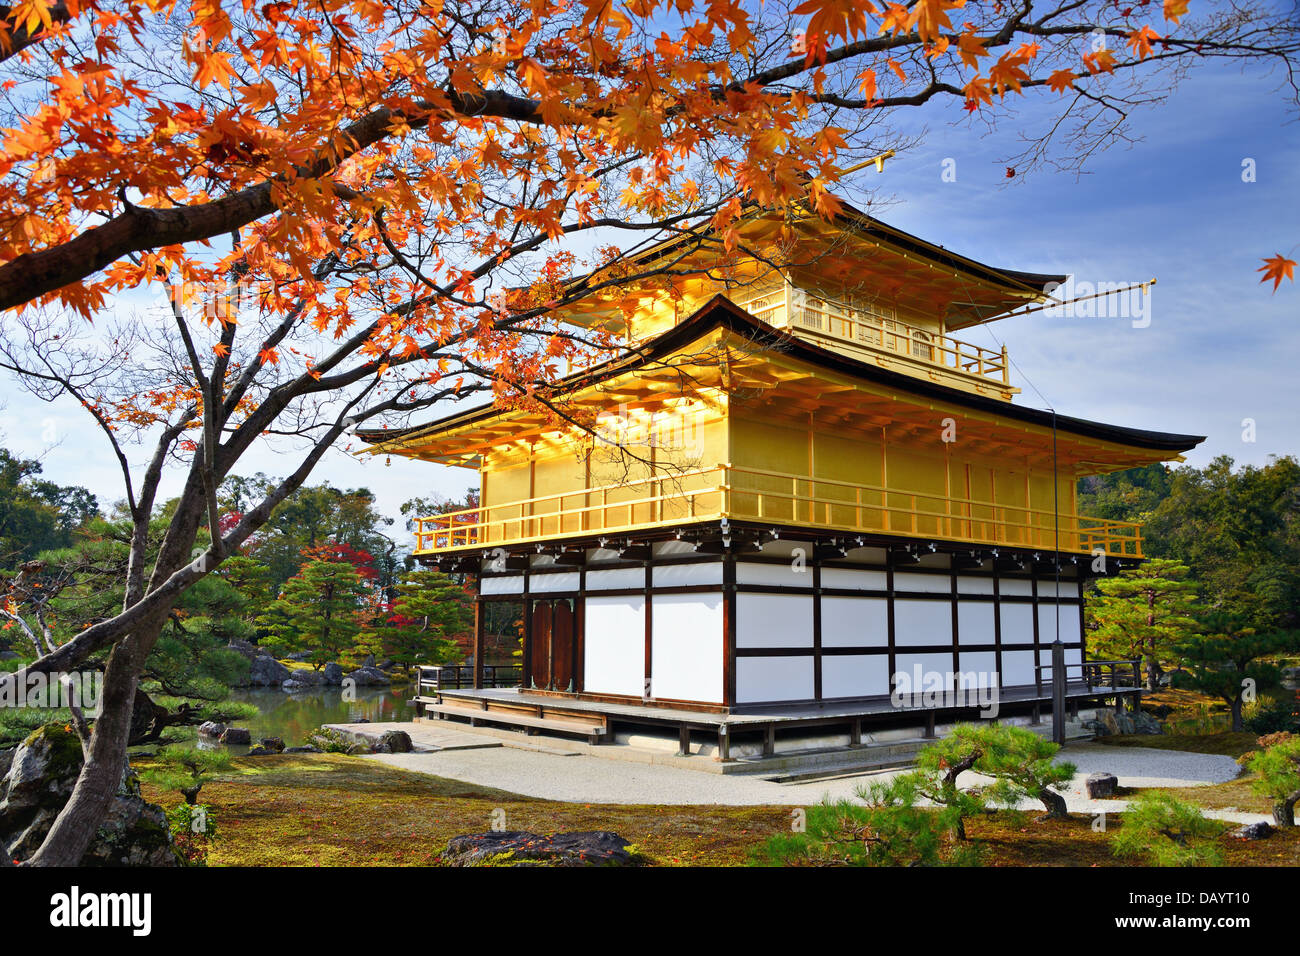 Tempel des goldenen Pavillons auf Kyoto, Japan. Stockbild